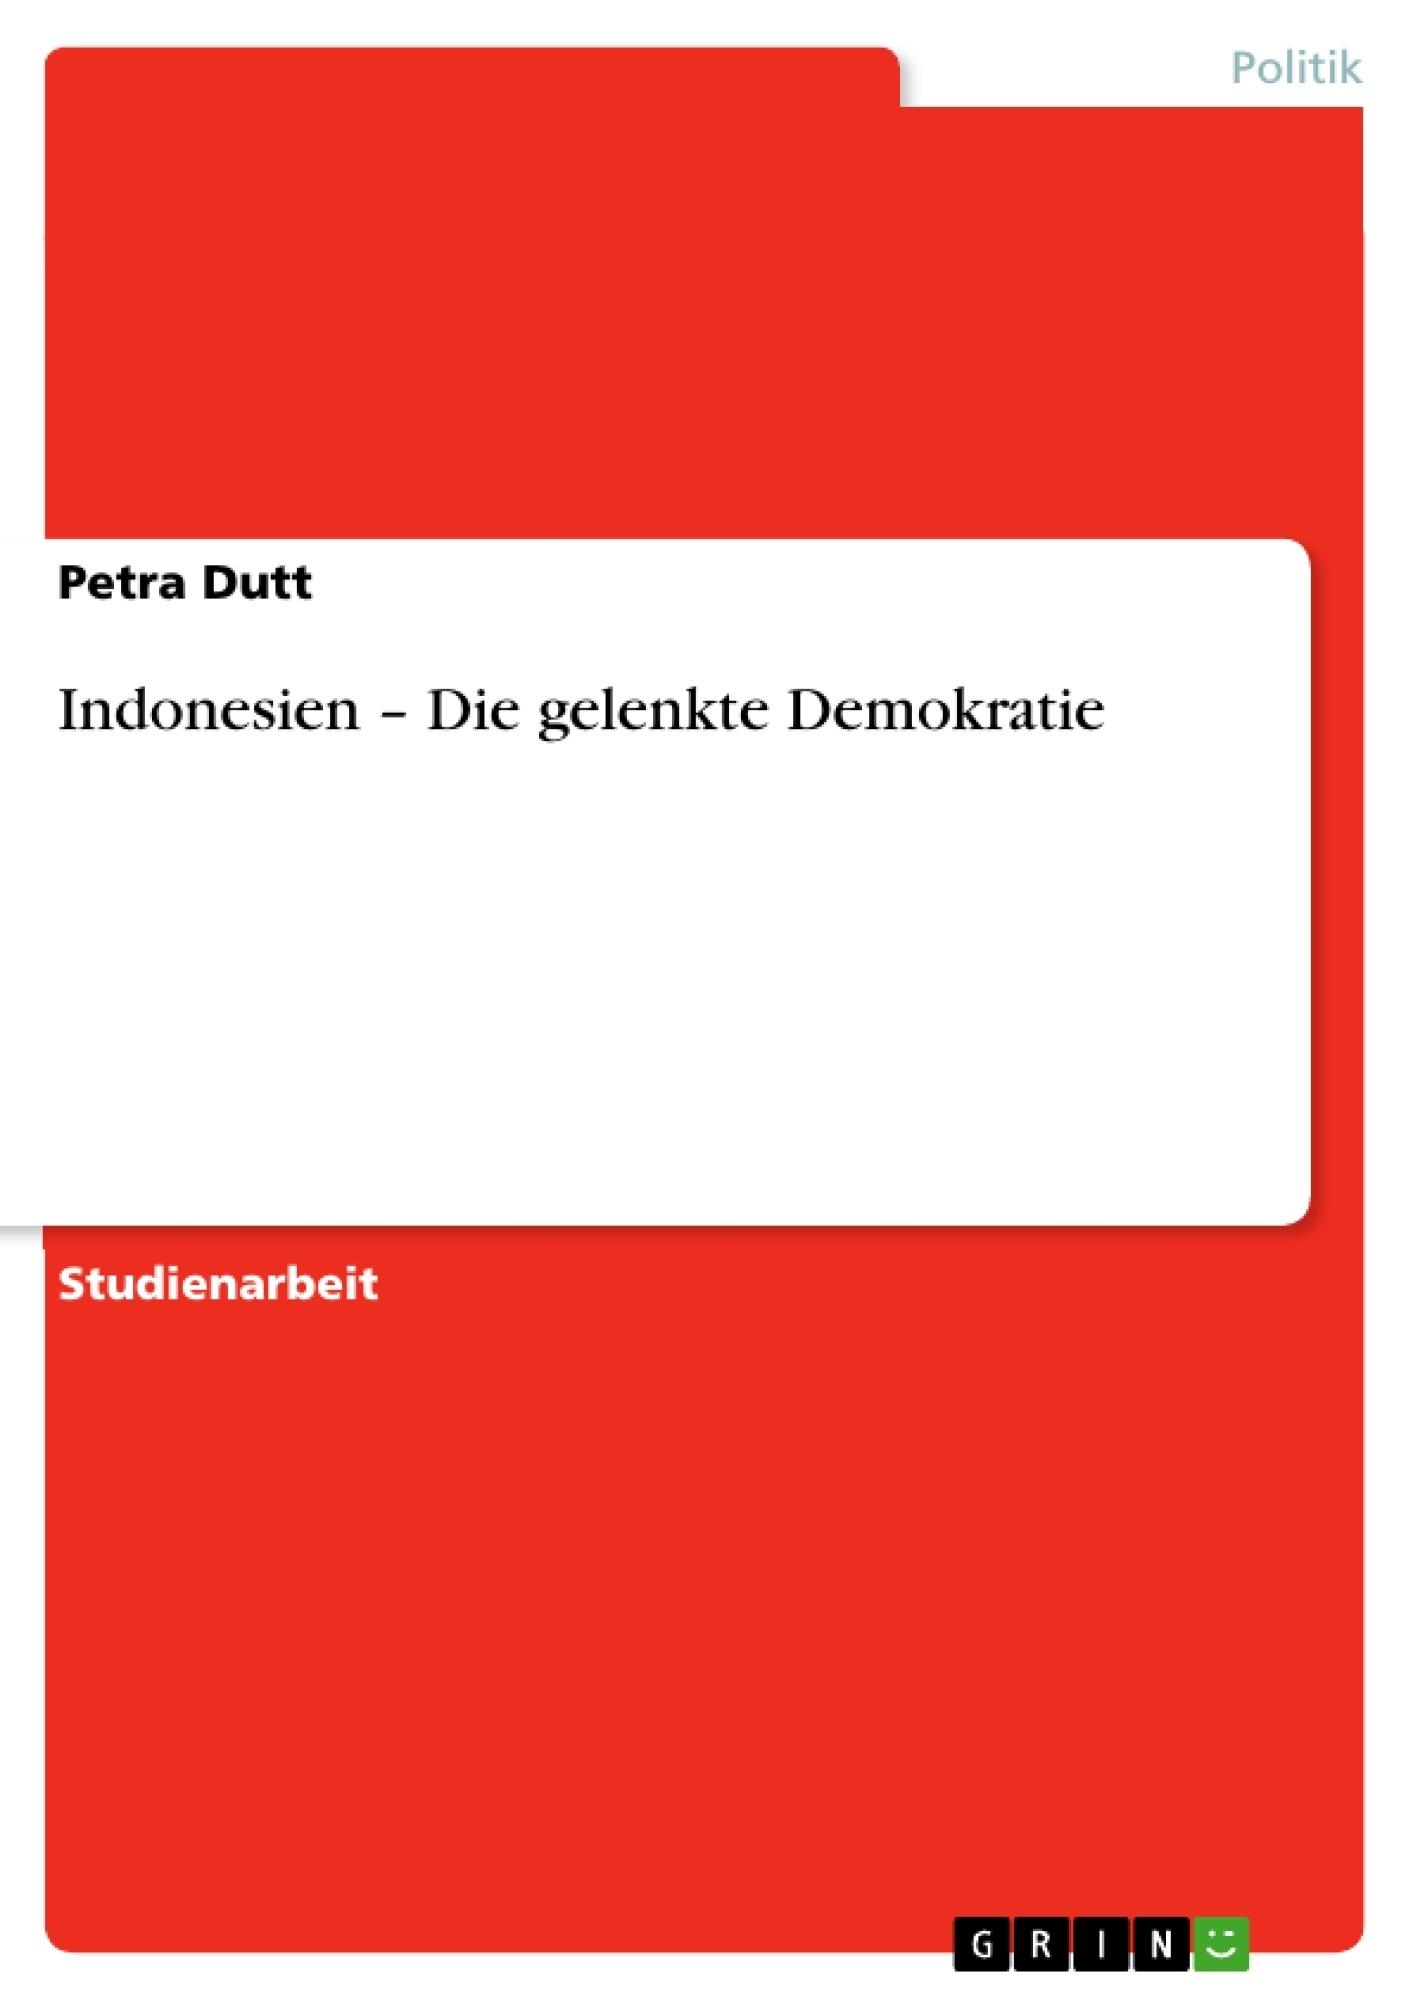 Titel: Indonesien – Die gelenkte Demokratie